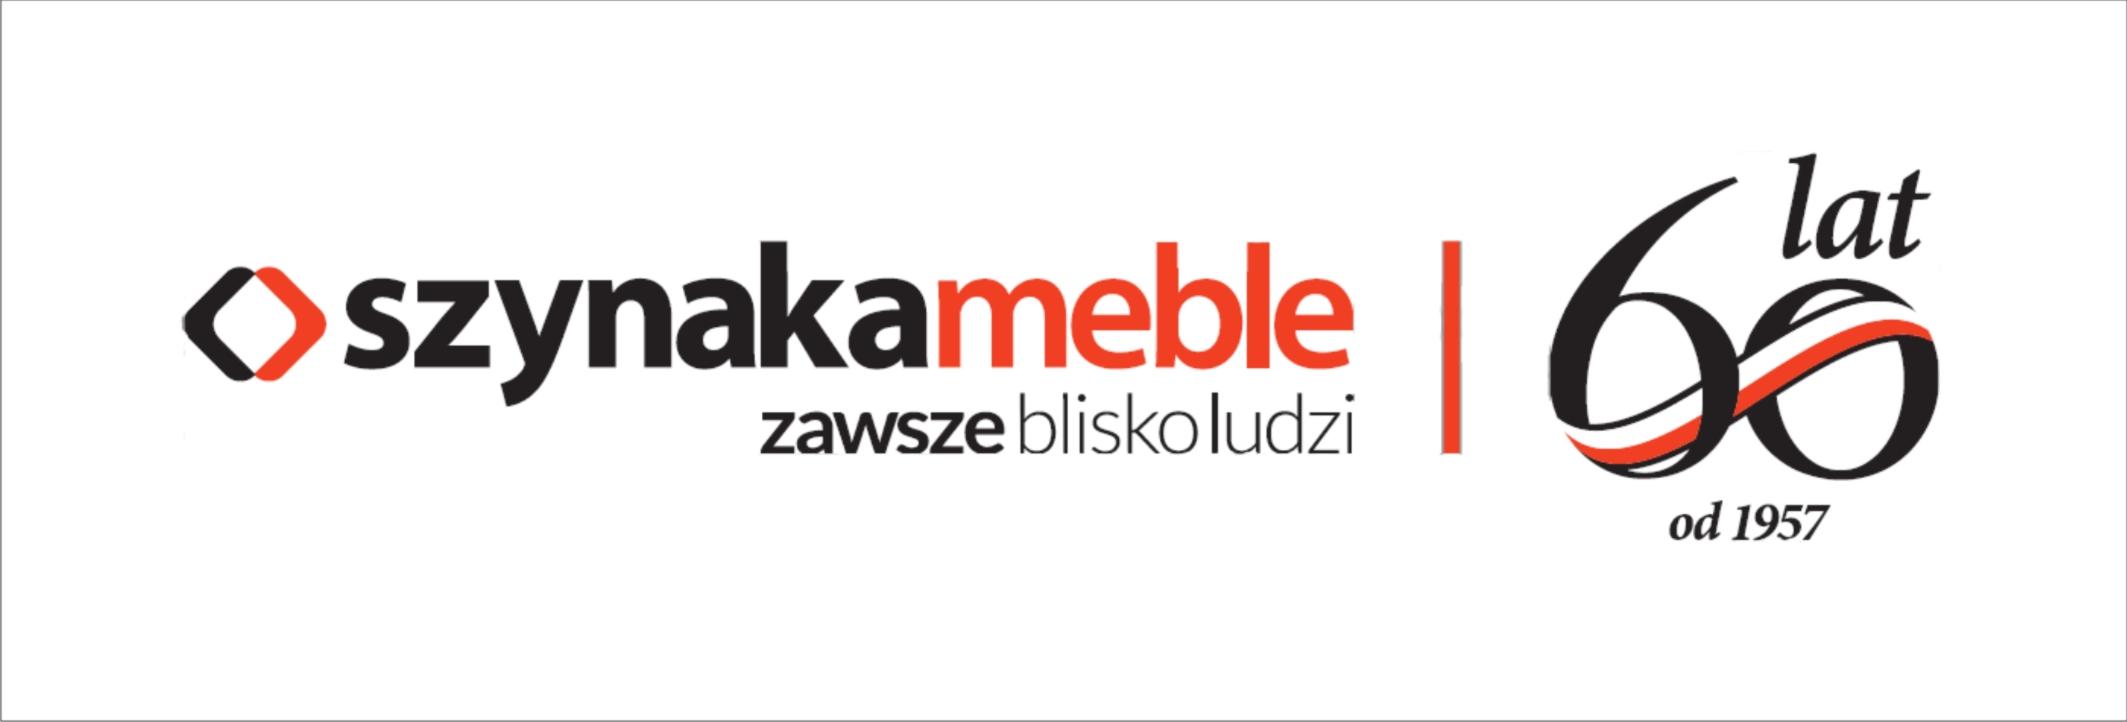 https://m.wmwm.pl/2017/07/orig/logo-szynaka-5744.jpg